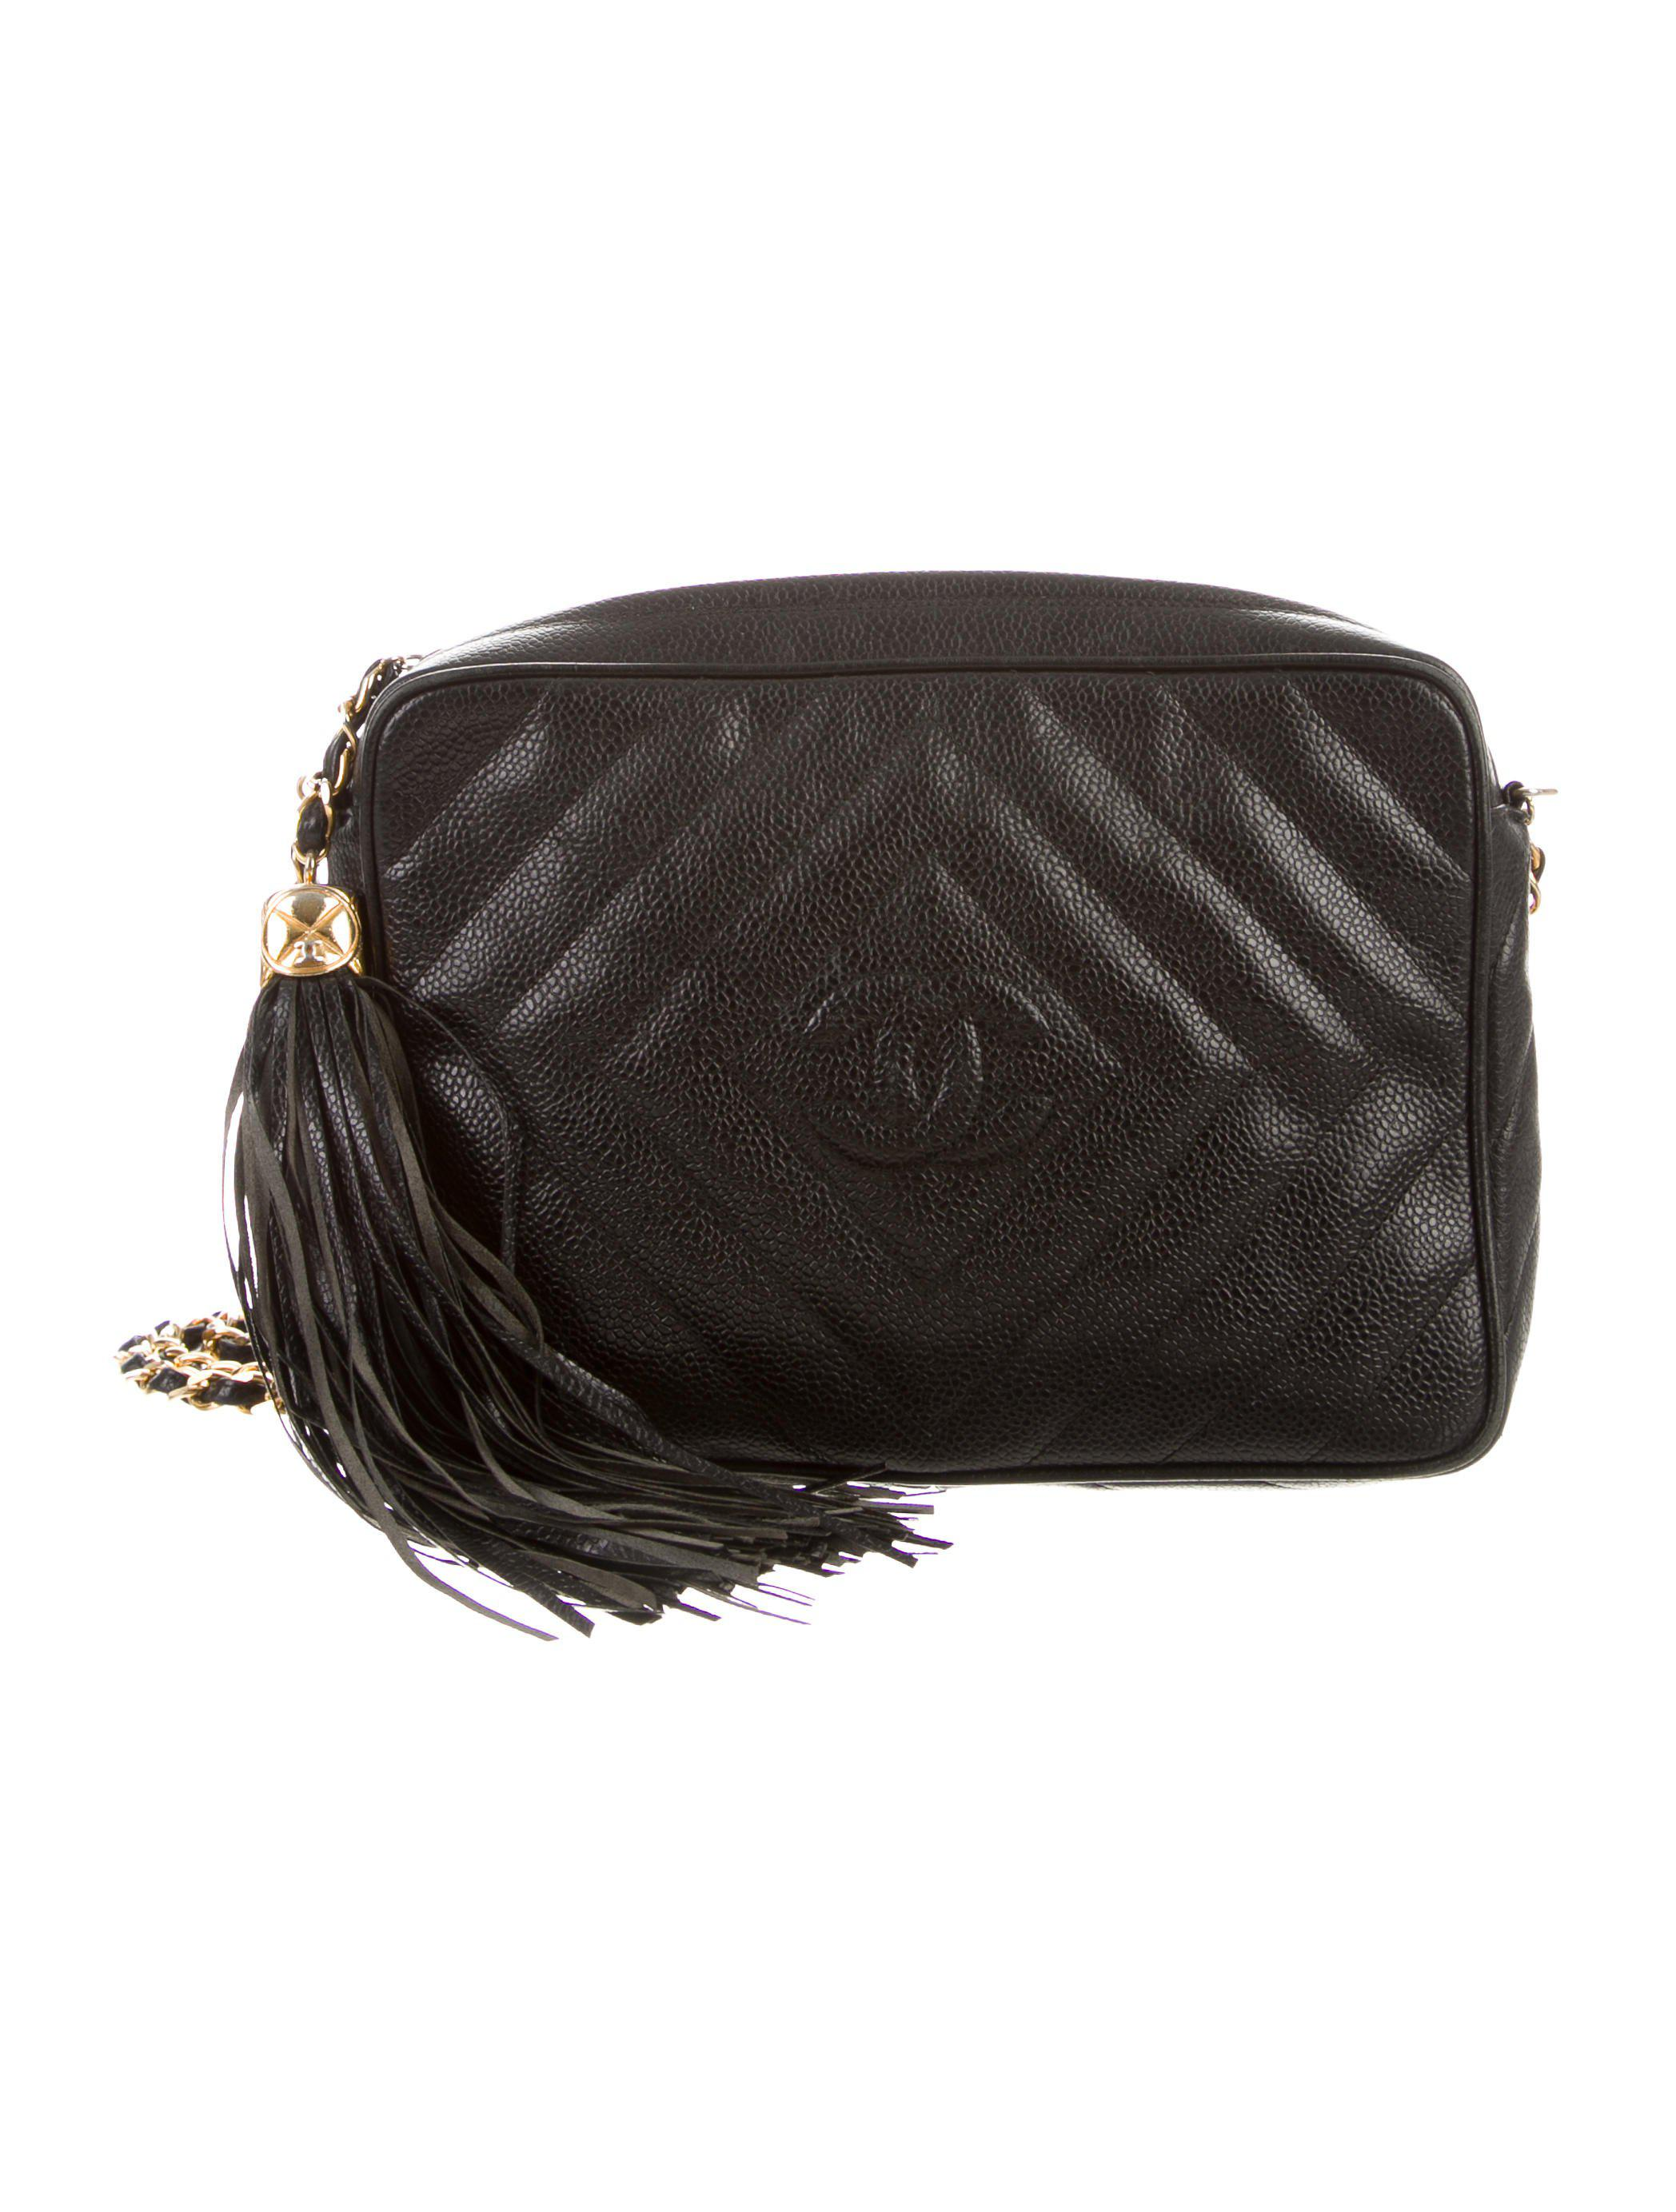 6eeaae471fe8 Lyst - Chanel Vintage Caviar Chevron Camera Bag Black in Metallic